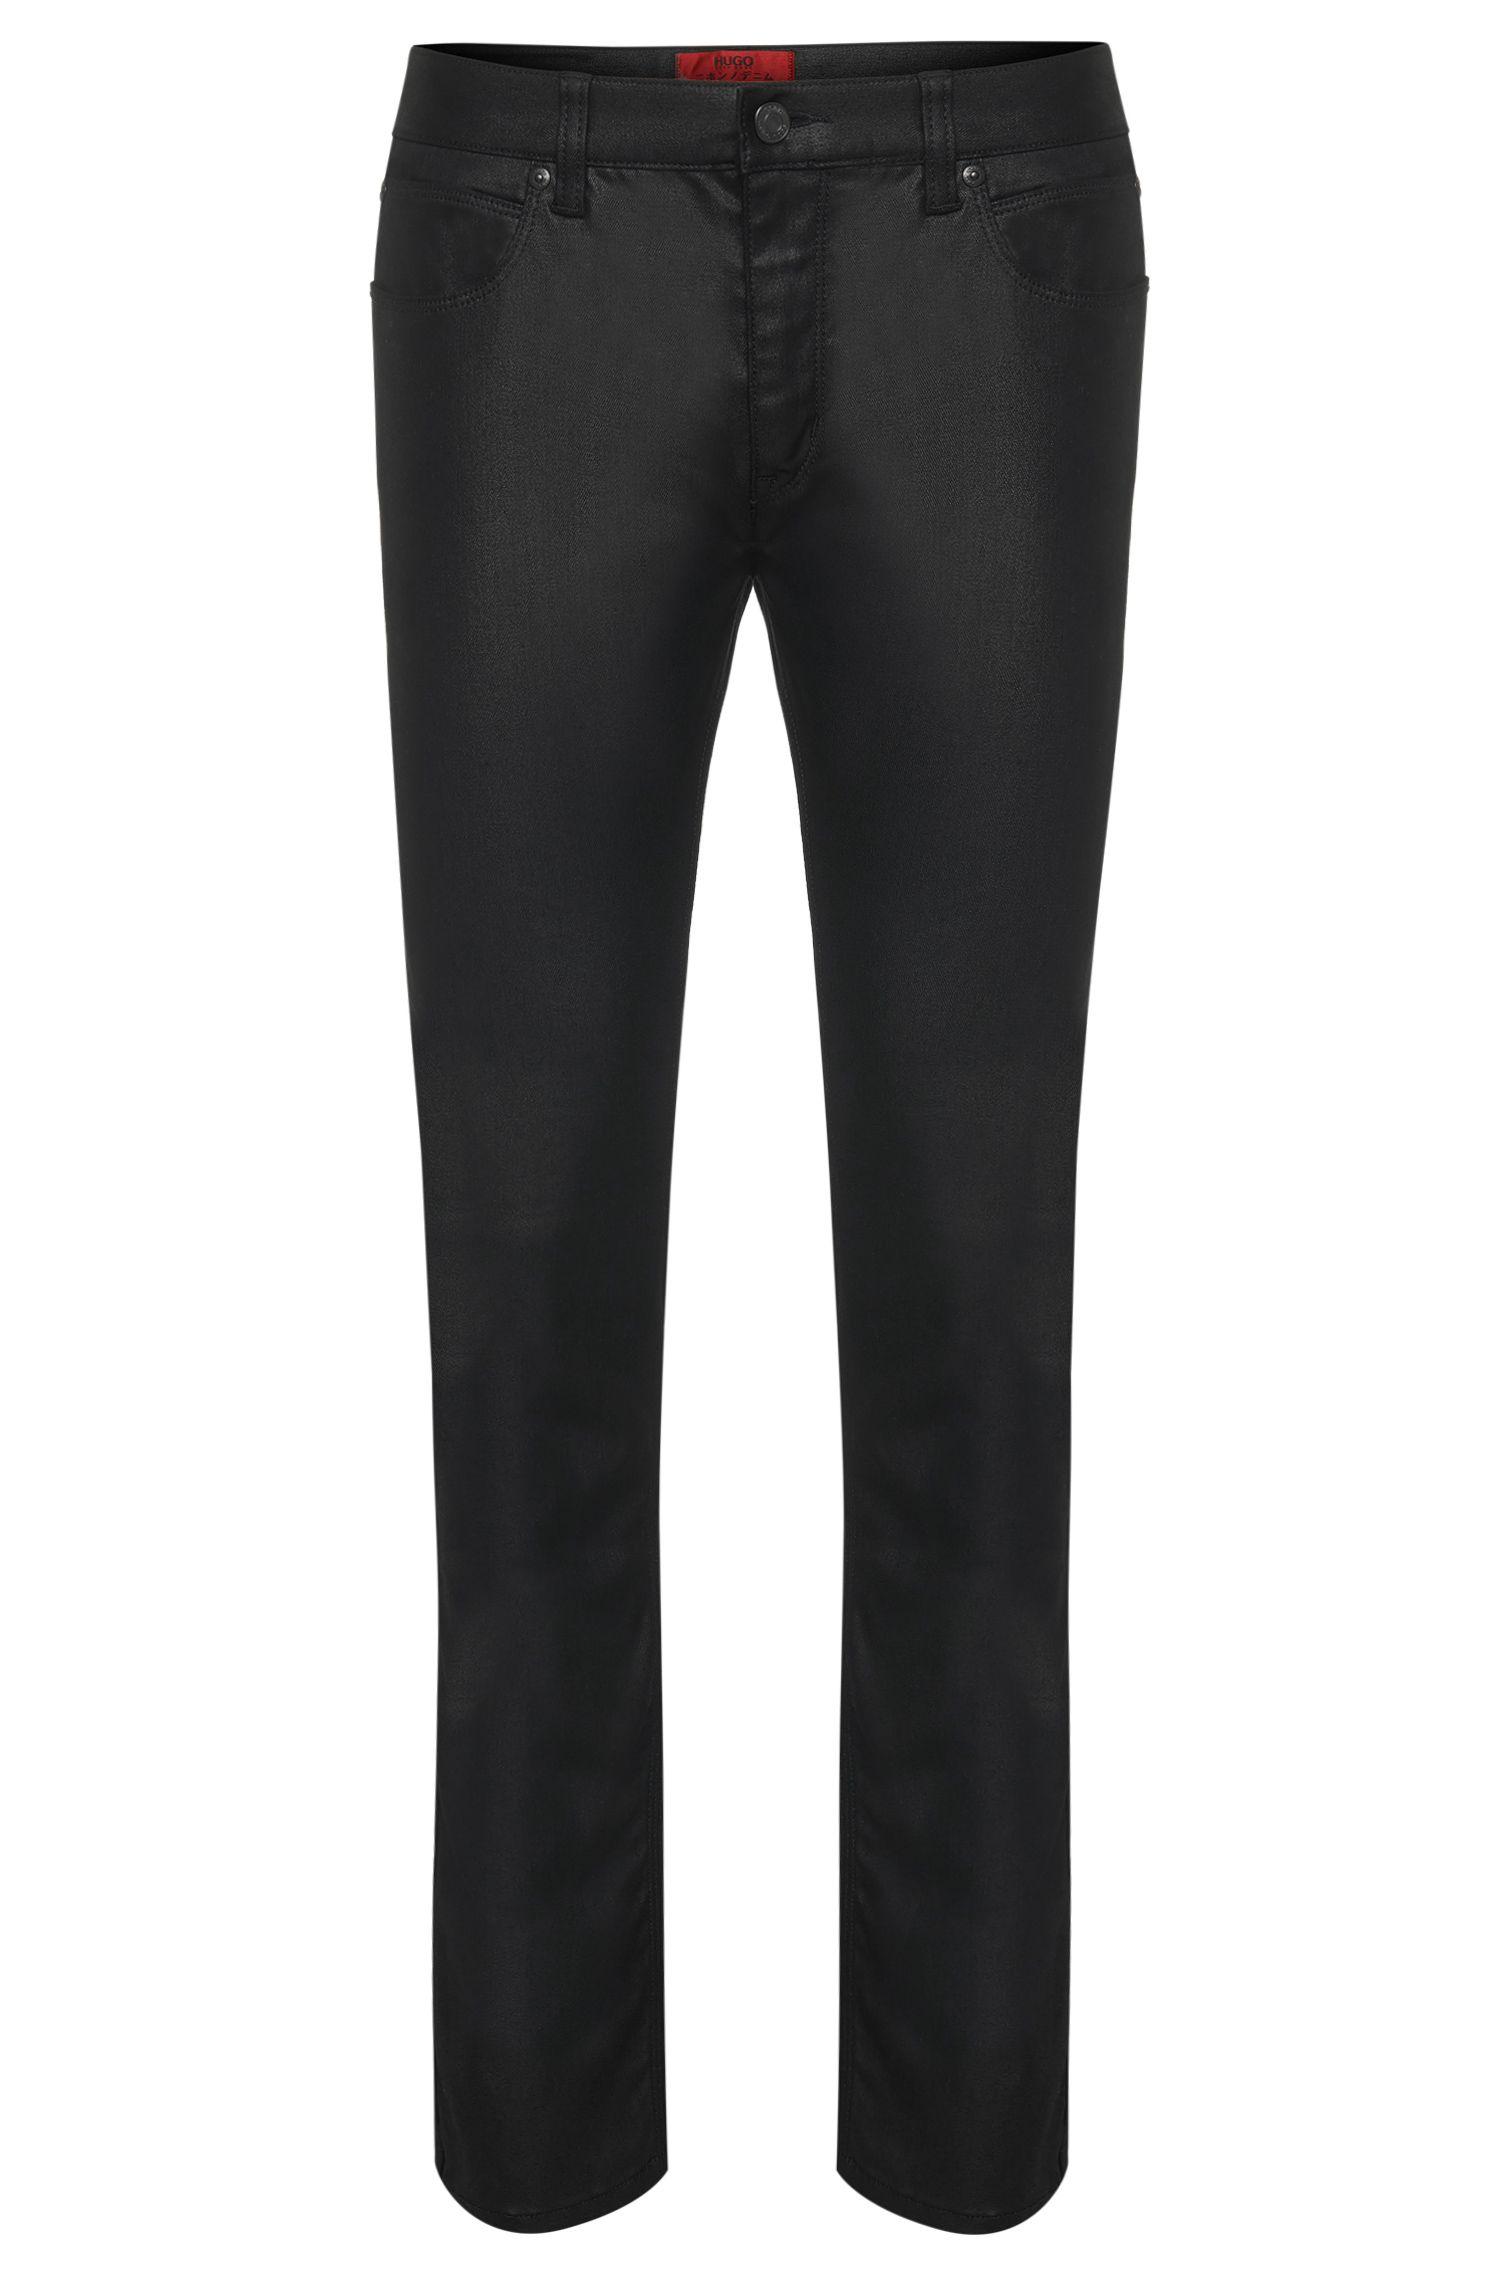 'HUGO 708' | Slim Fit, 9 oz Stretch Cotton Blend Jeans